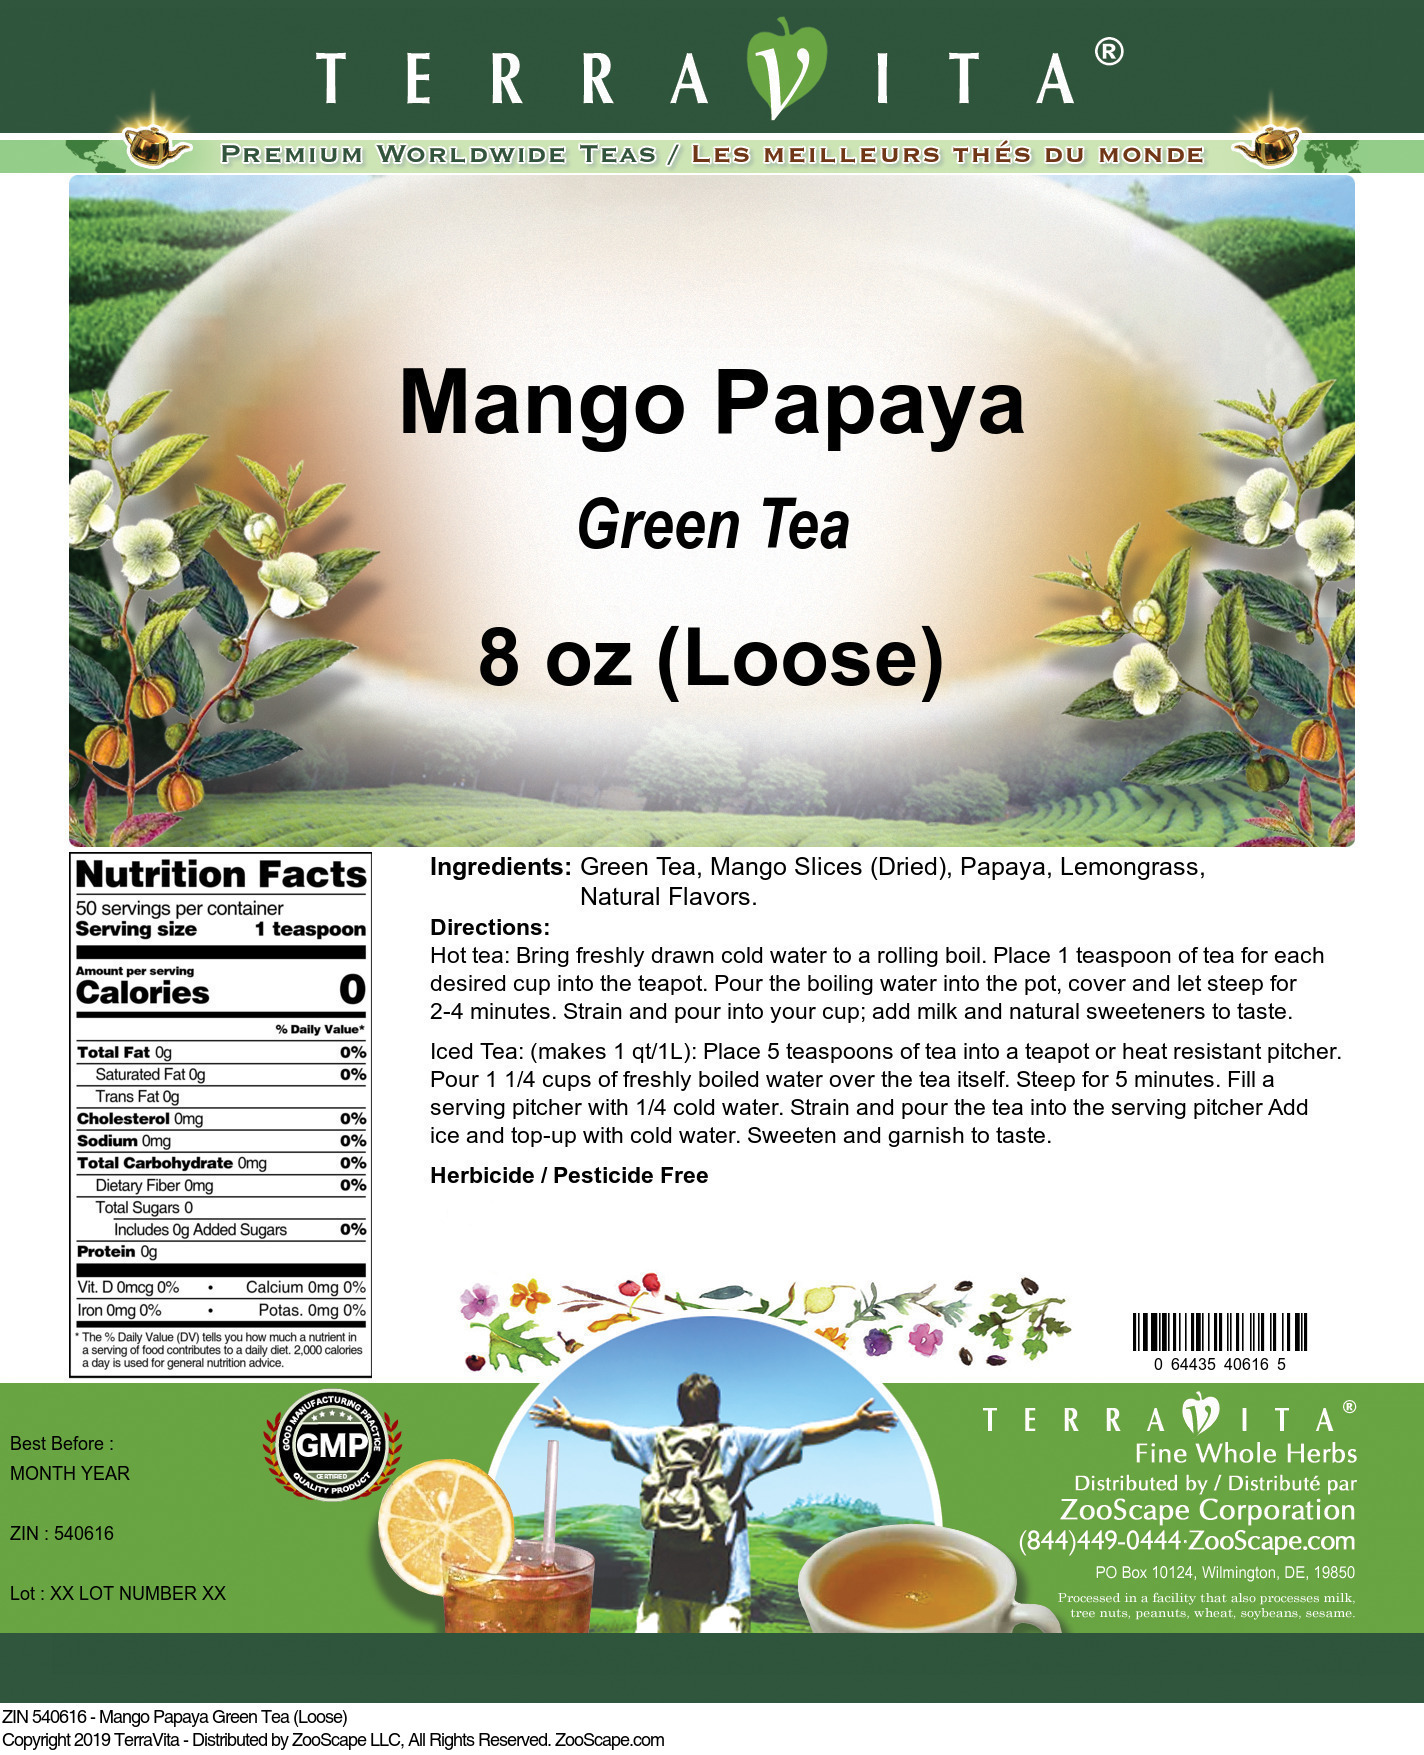 Mango Papaya Green Tea